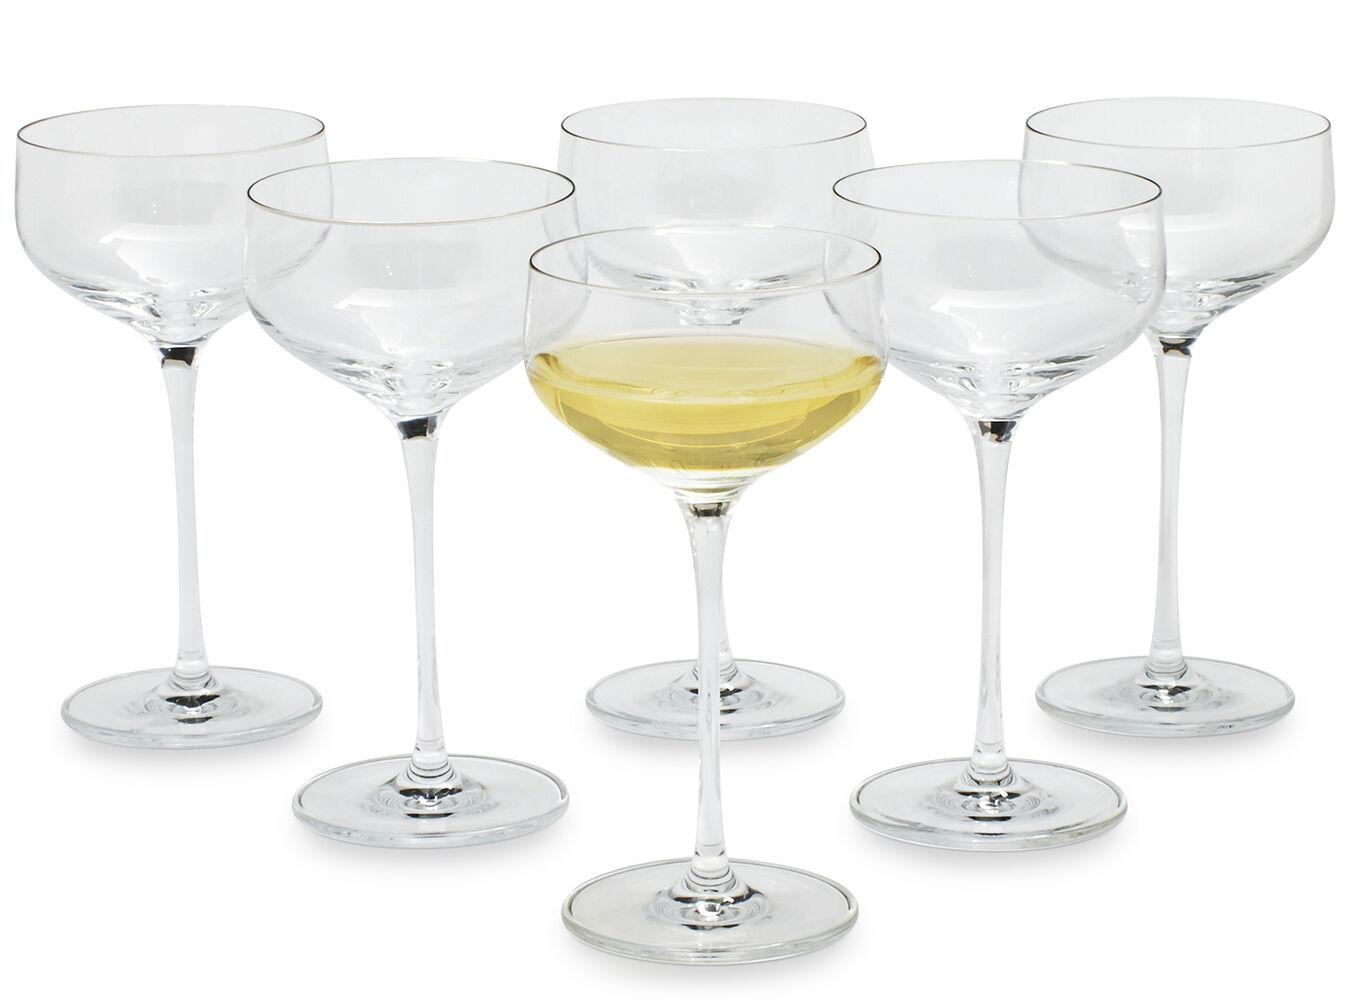 Schott Zwiesel Air Dessert Wine Glasses, Set of 6 | Sur La Table